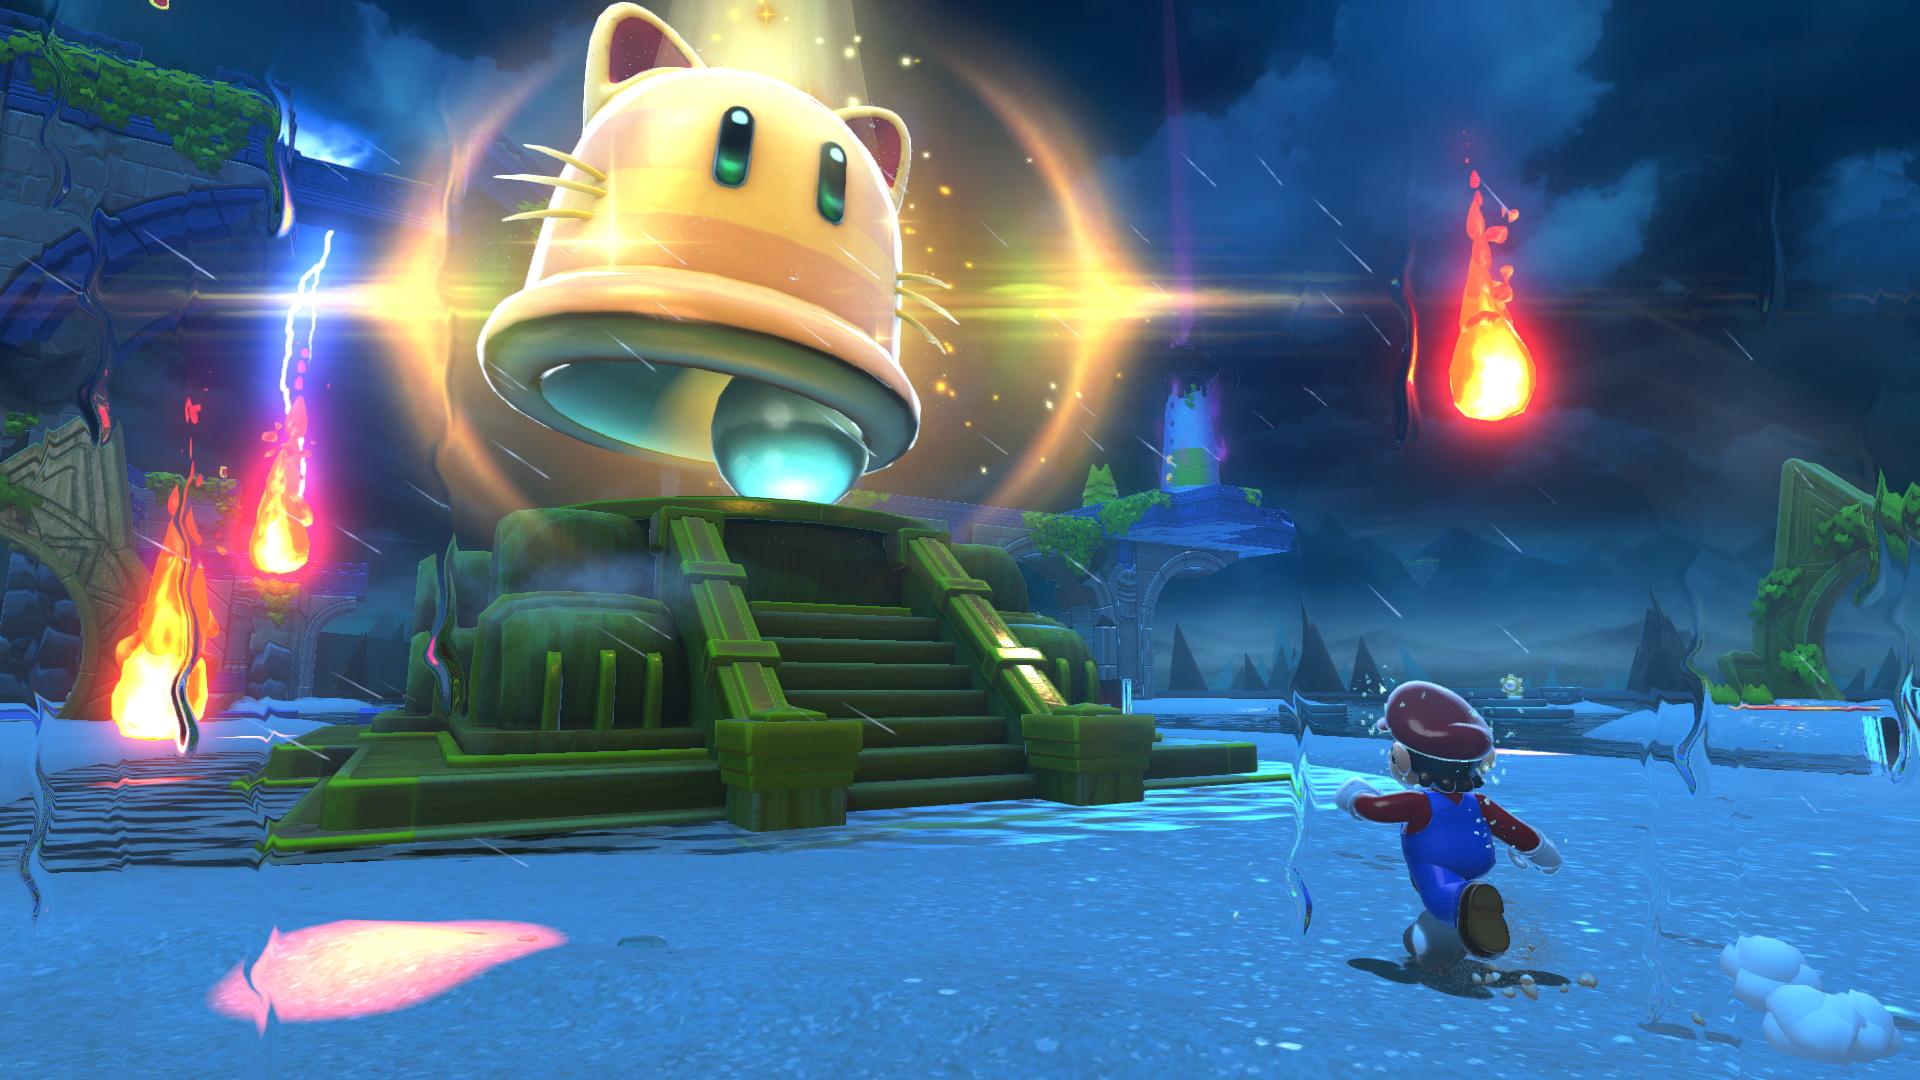 Super Mario 3D World + Bowser's Fury screenshot: the giga bell